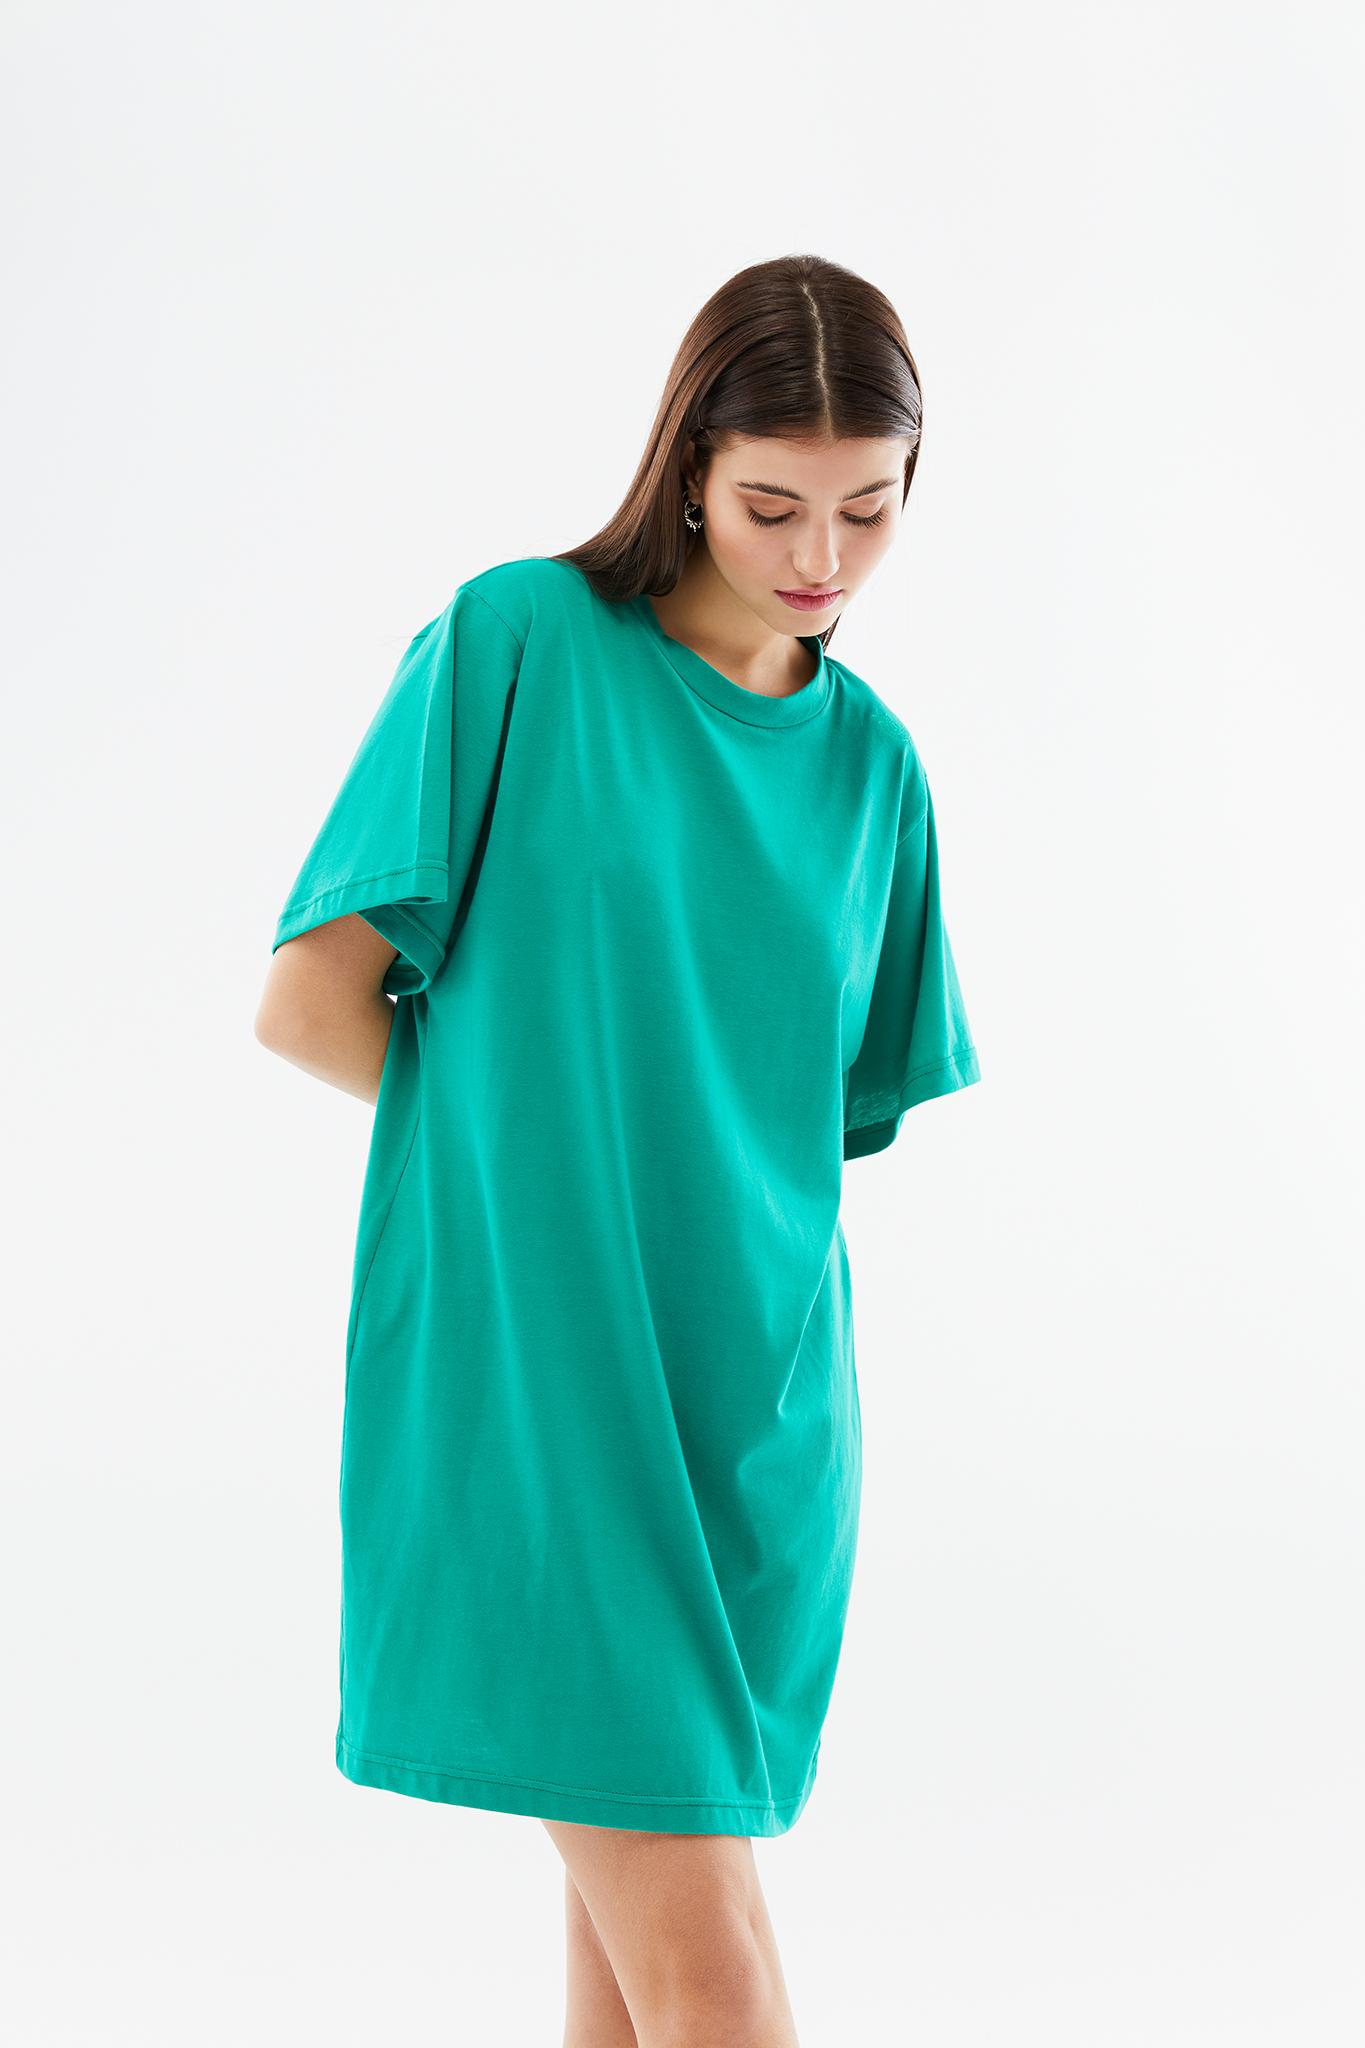 BLAMEYOURDAZE GREEN DRESS